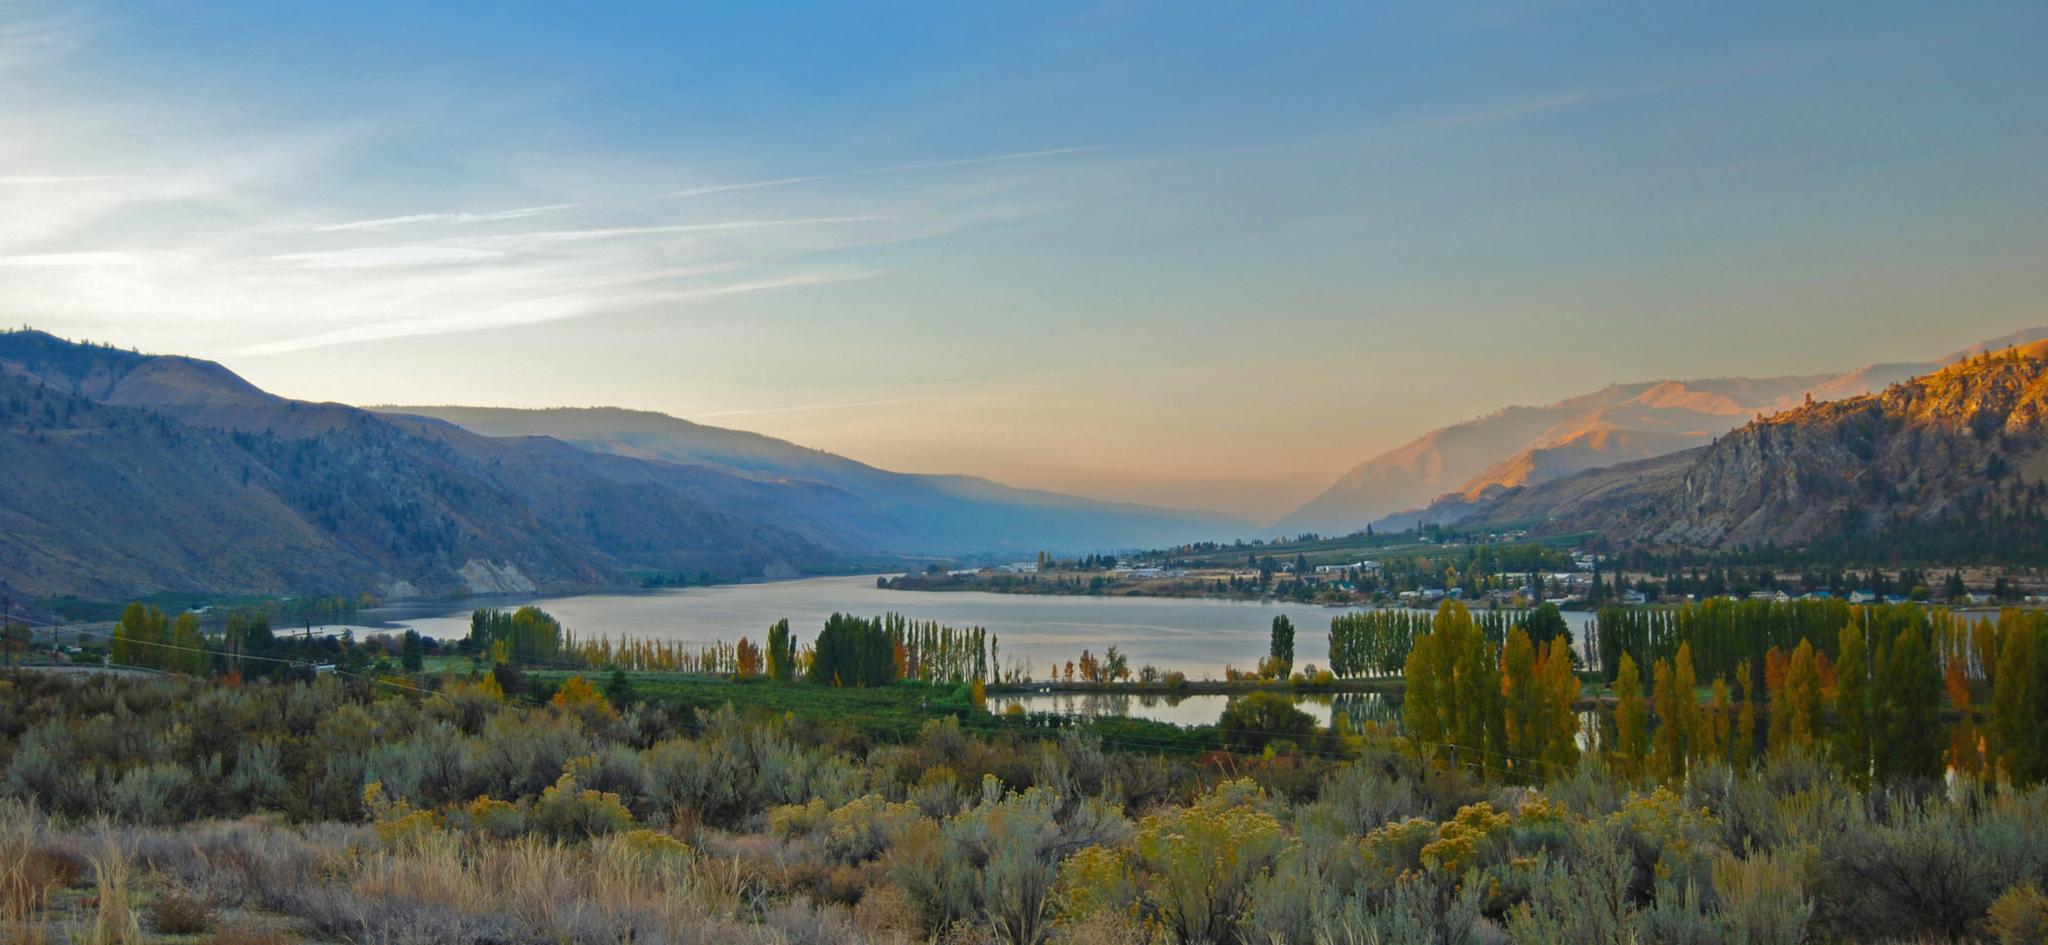 Lake Chelan, Washington by Touch of Nature